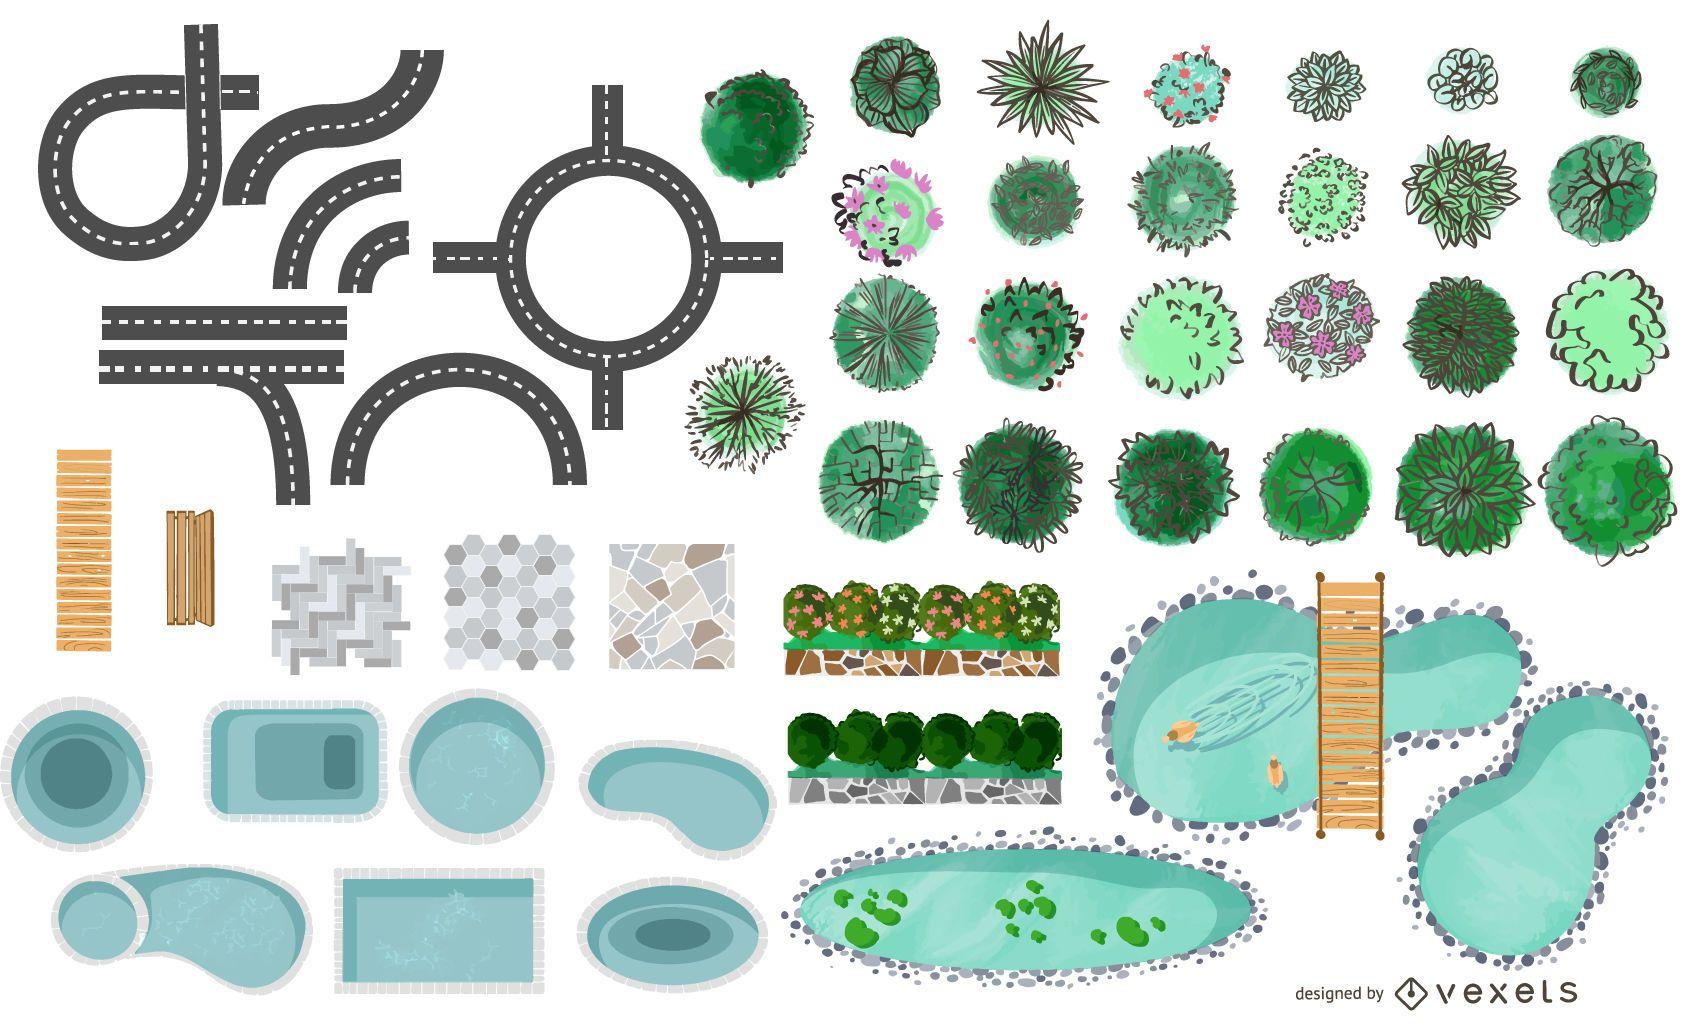 Paquete de elementos de parque de arquitectura urbana